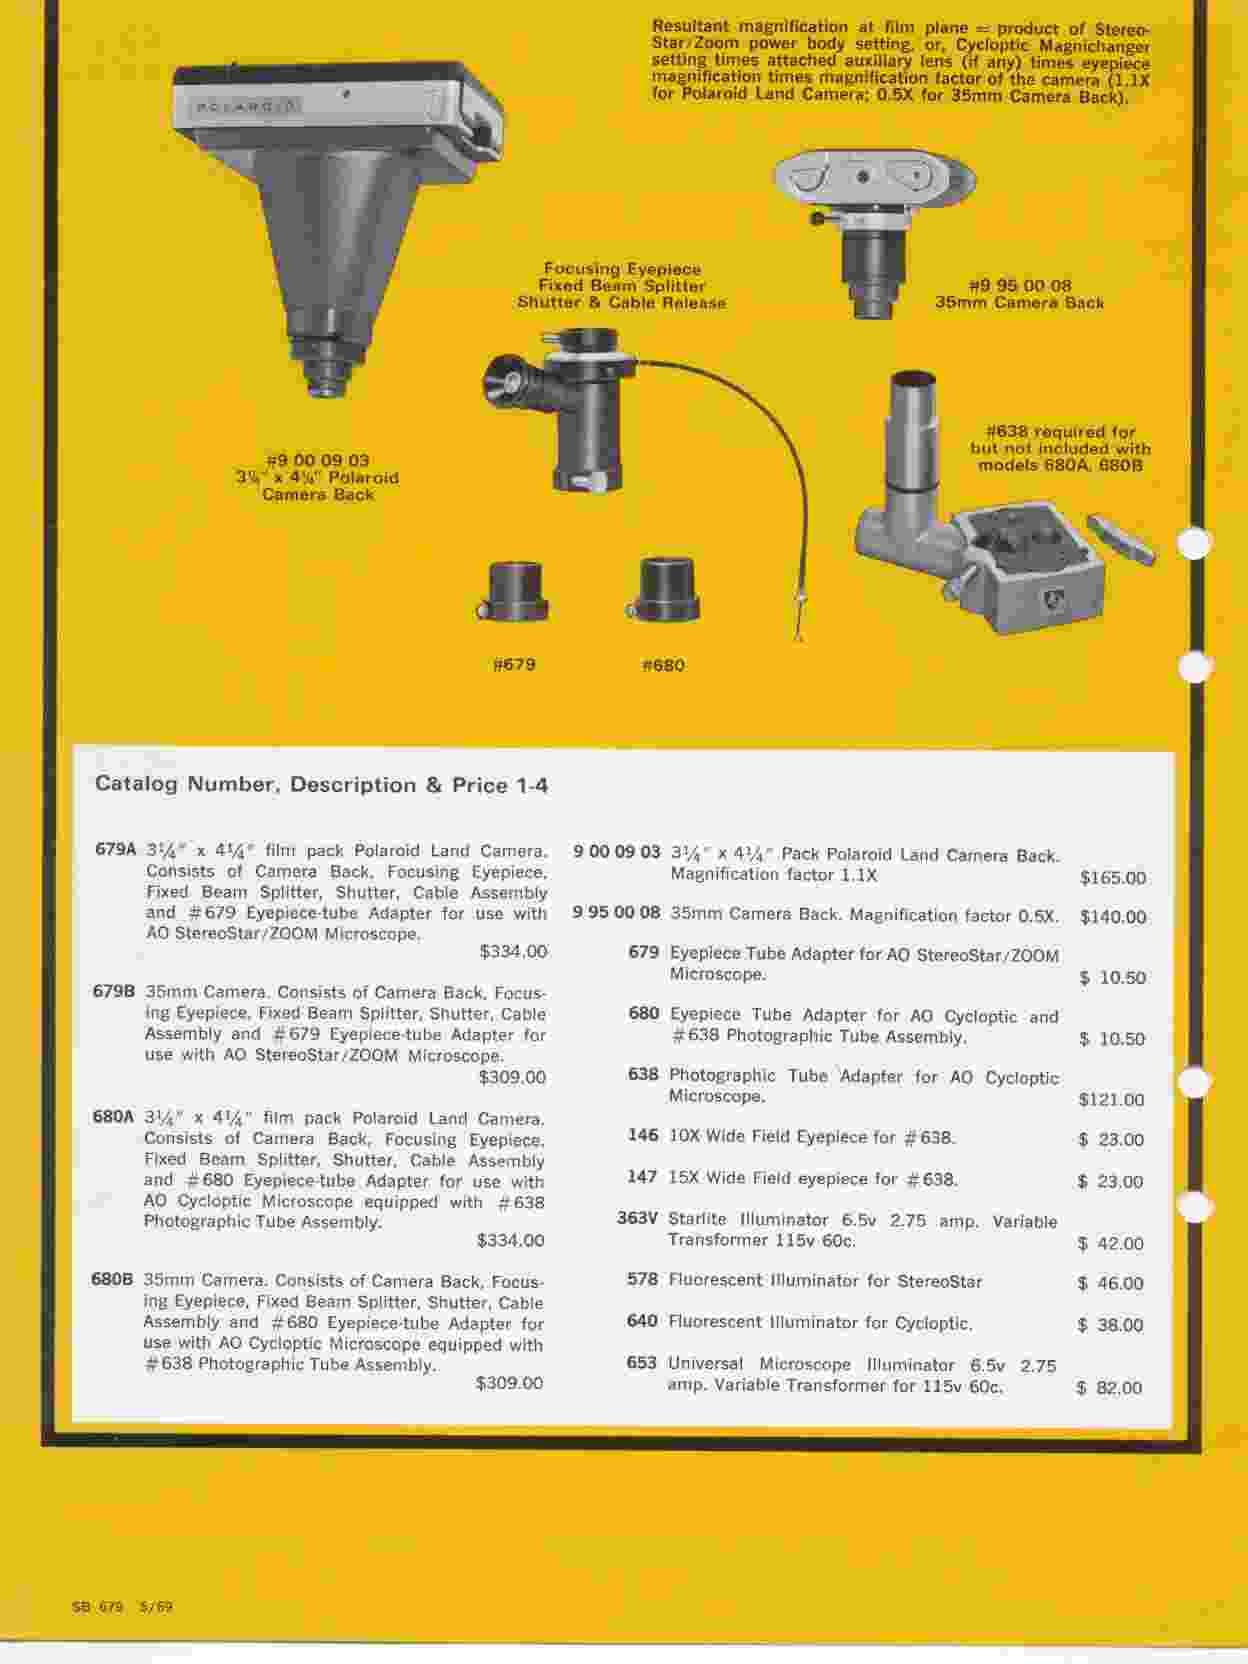 Vintage Original Manuals And Product Sheets 228 Ldre